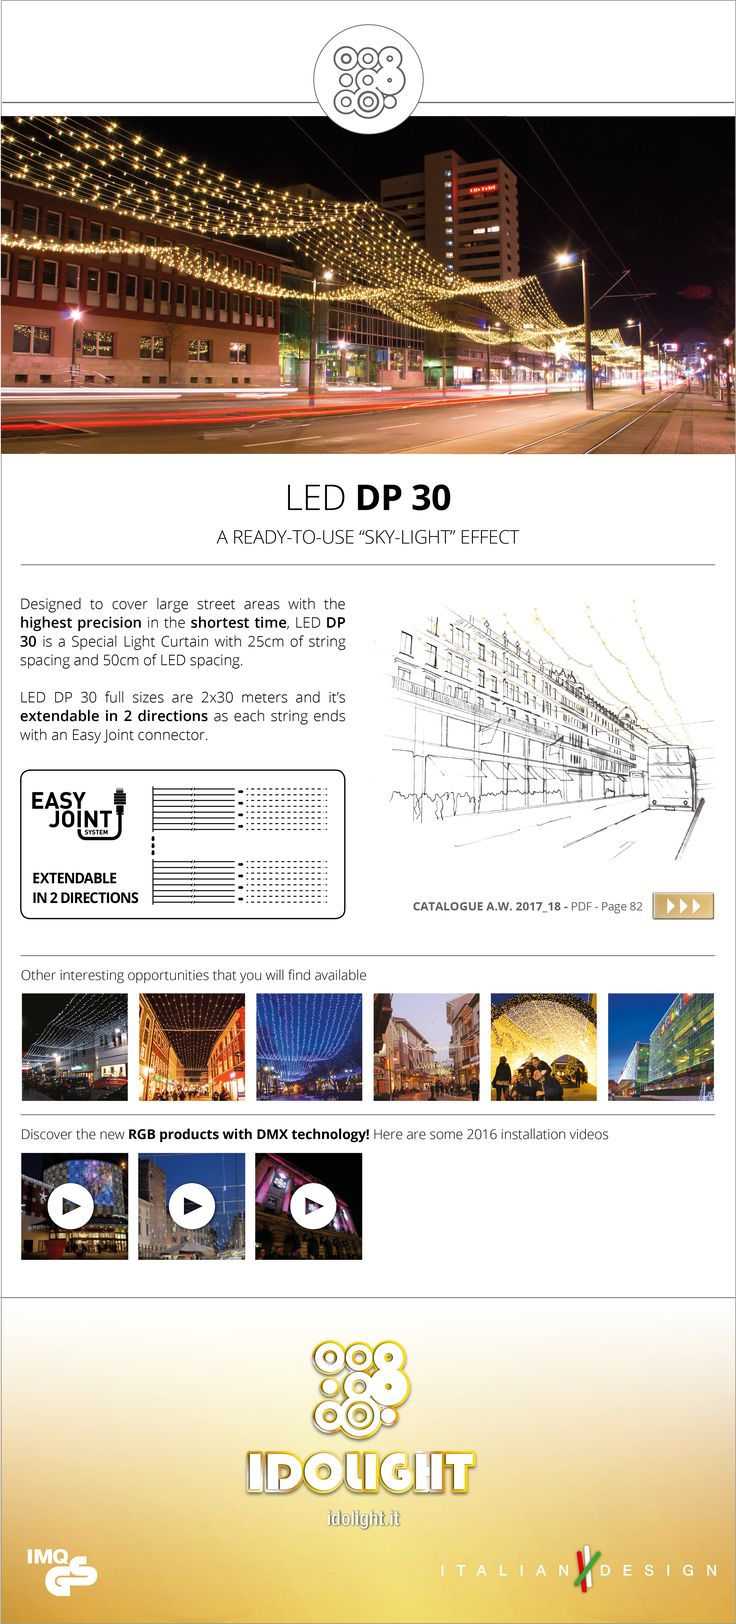 LED DP 30, the highest precision in the shortest time!  #idolight #streetdecoration #citylighting #readytogo